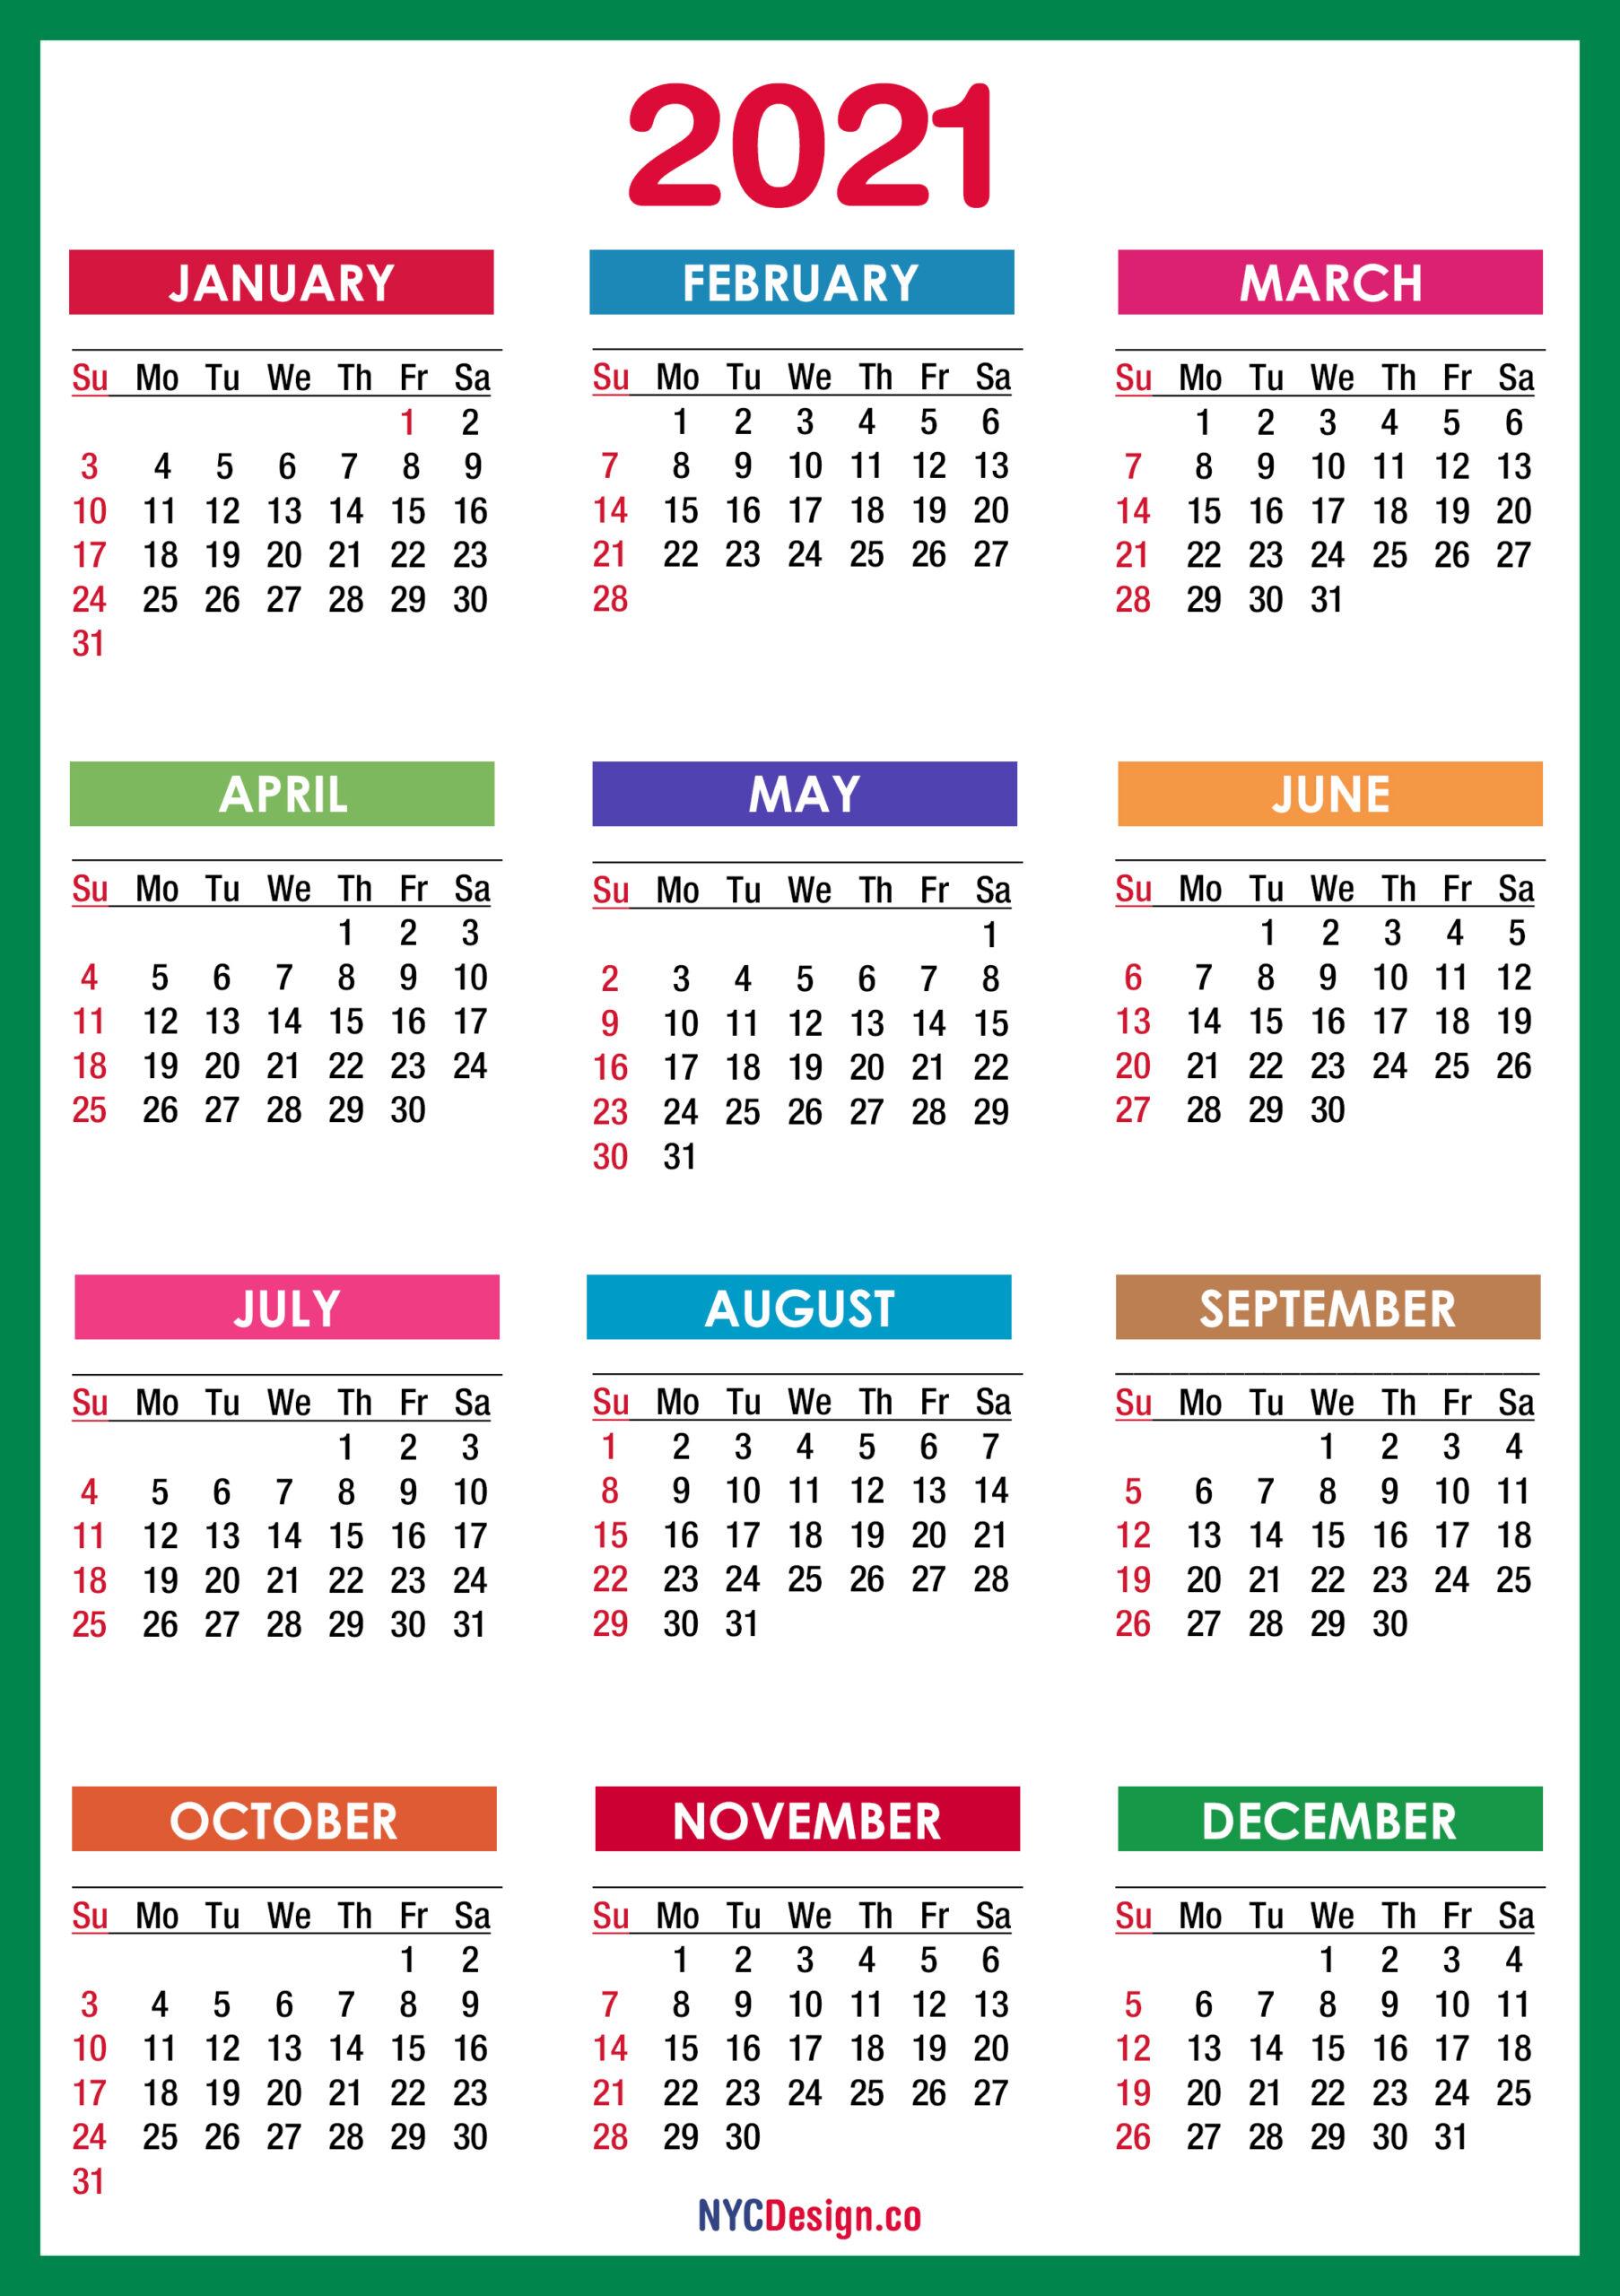 2021 Calendar Printable Free, Pdf, Colorful, Blue, Green